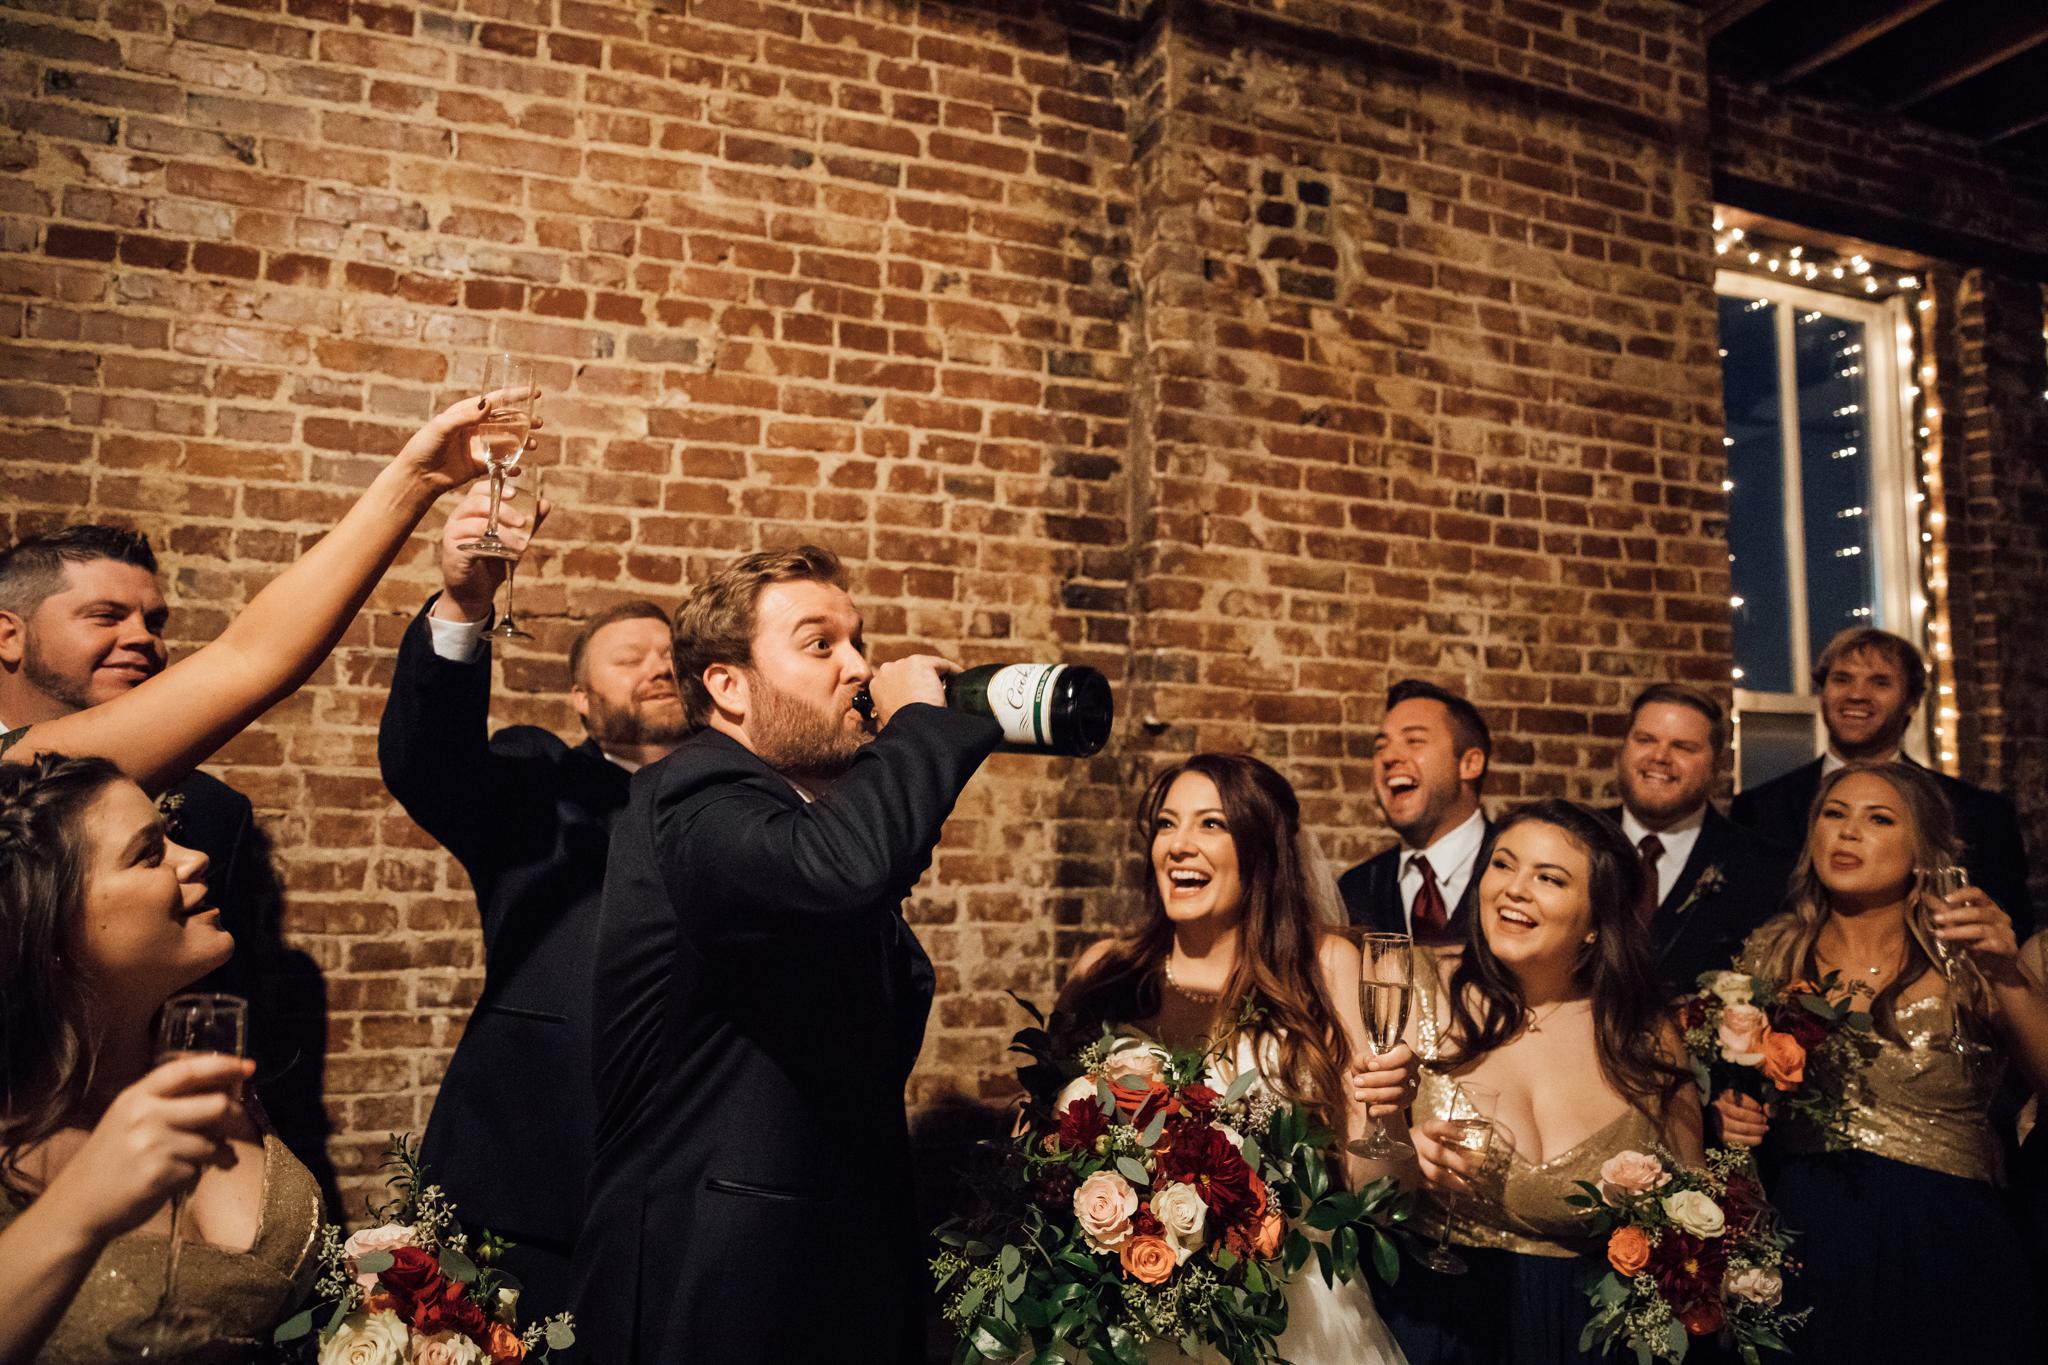 memphis-wedding-photographers-thewarmtharoundyou-ballinese-ballroom (115 of 232).jpg